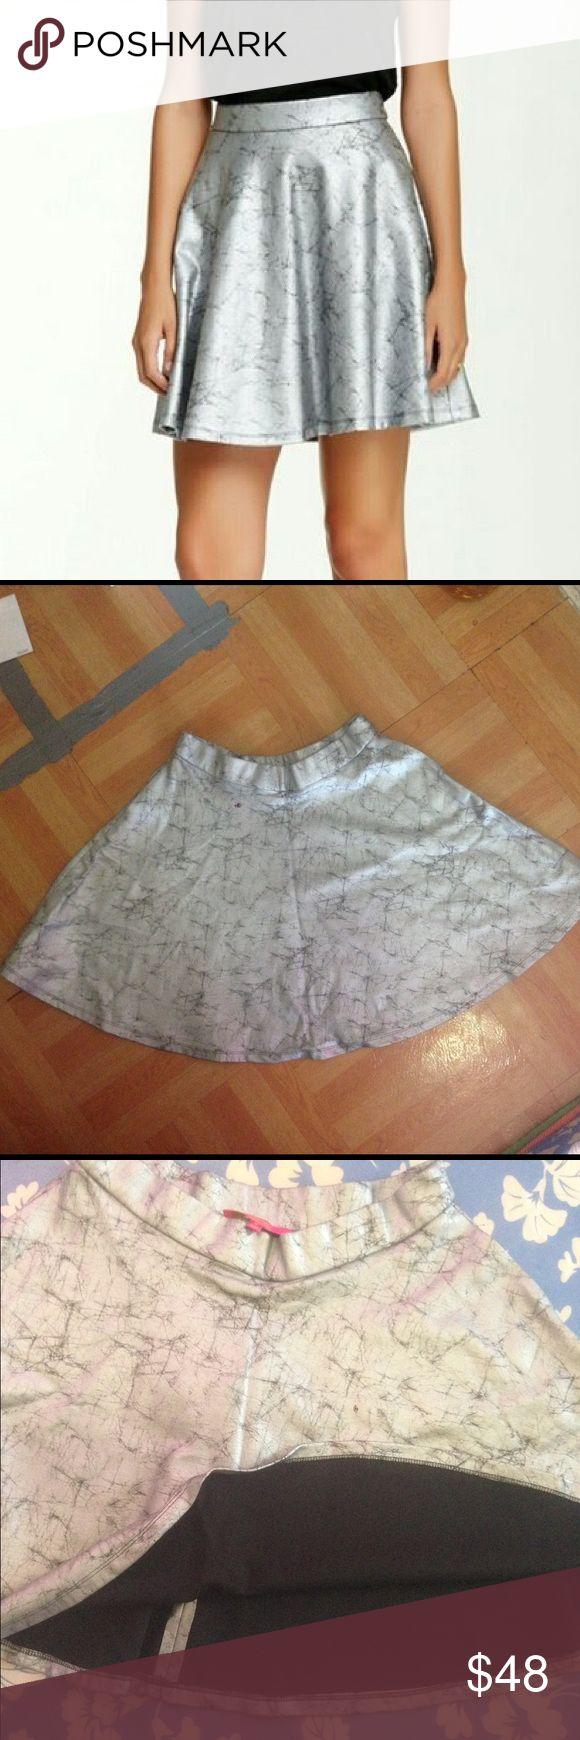 Catherine Malandrino Metallic Mini Skirt US 8/10. Very nice Catherine Malandrino women's metallic mini skirt Medium for US size 8/10. New with tag! Pull on closure. Catherine Malandrino Skirts Mini